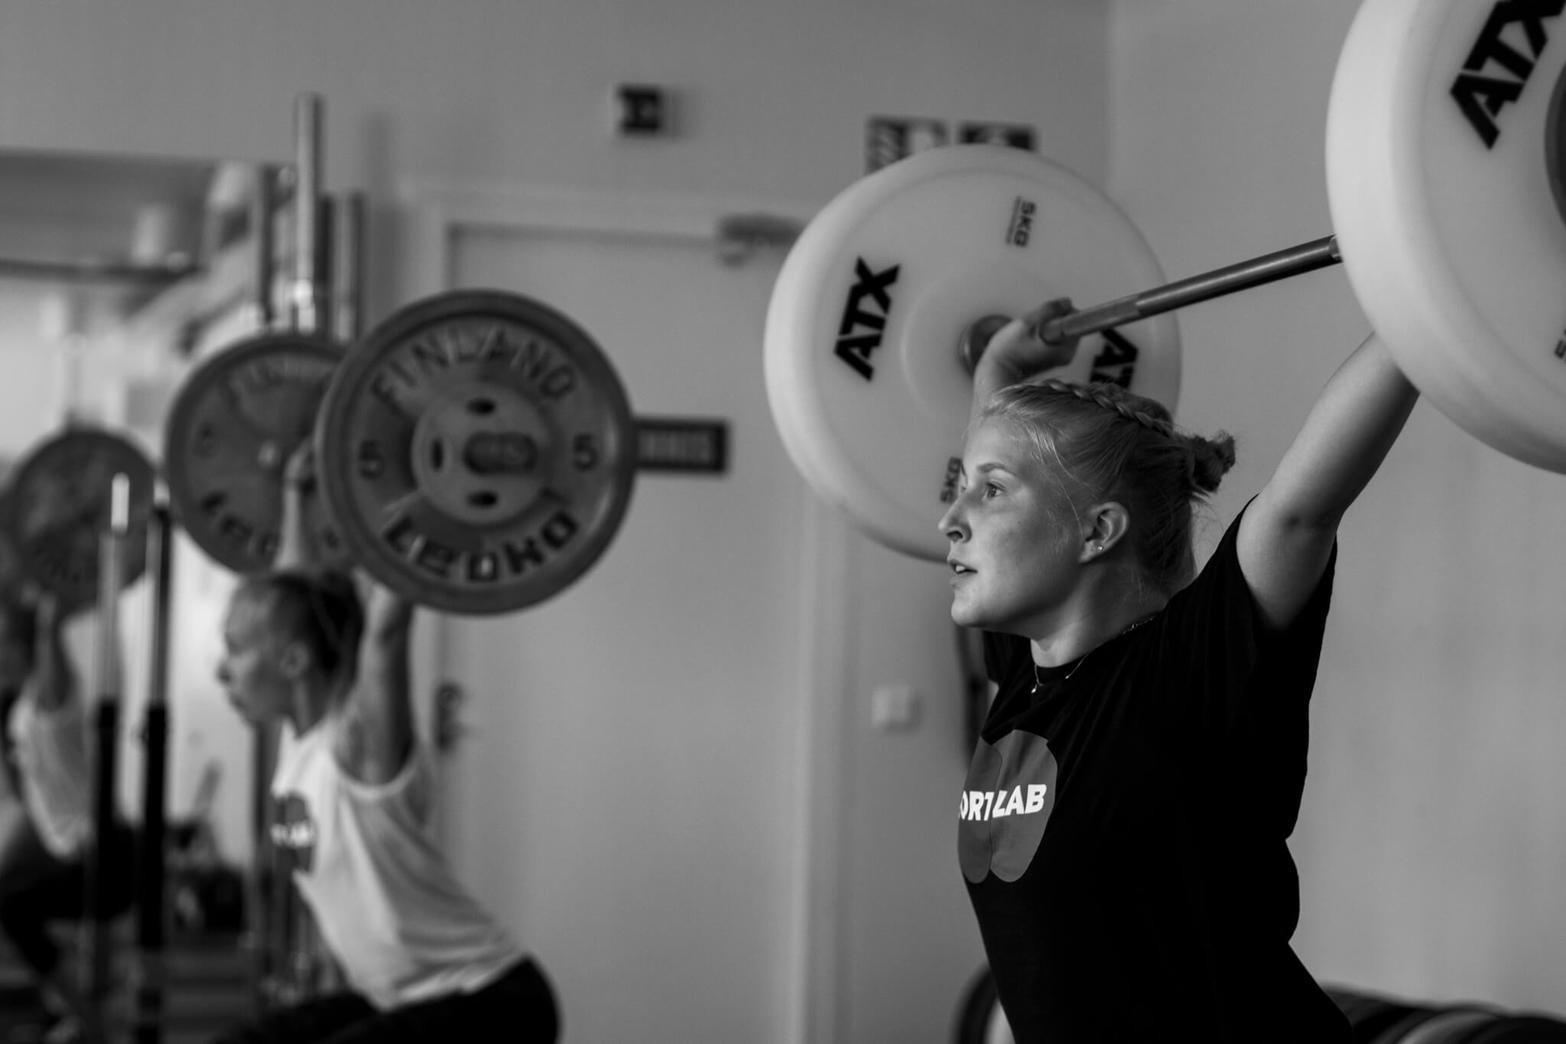 Riina_Koskinen_Sport_Lab_squash